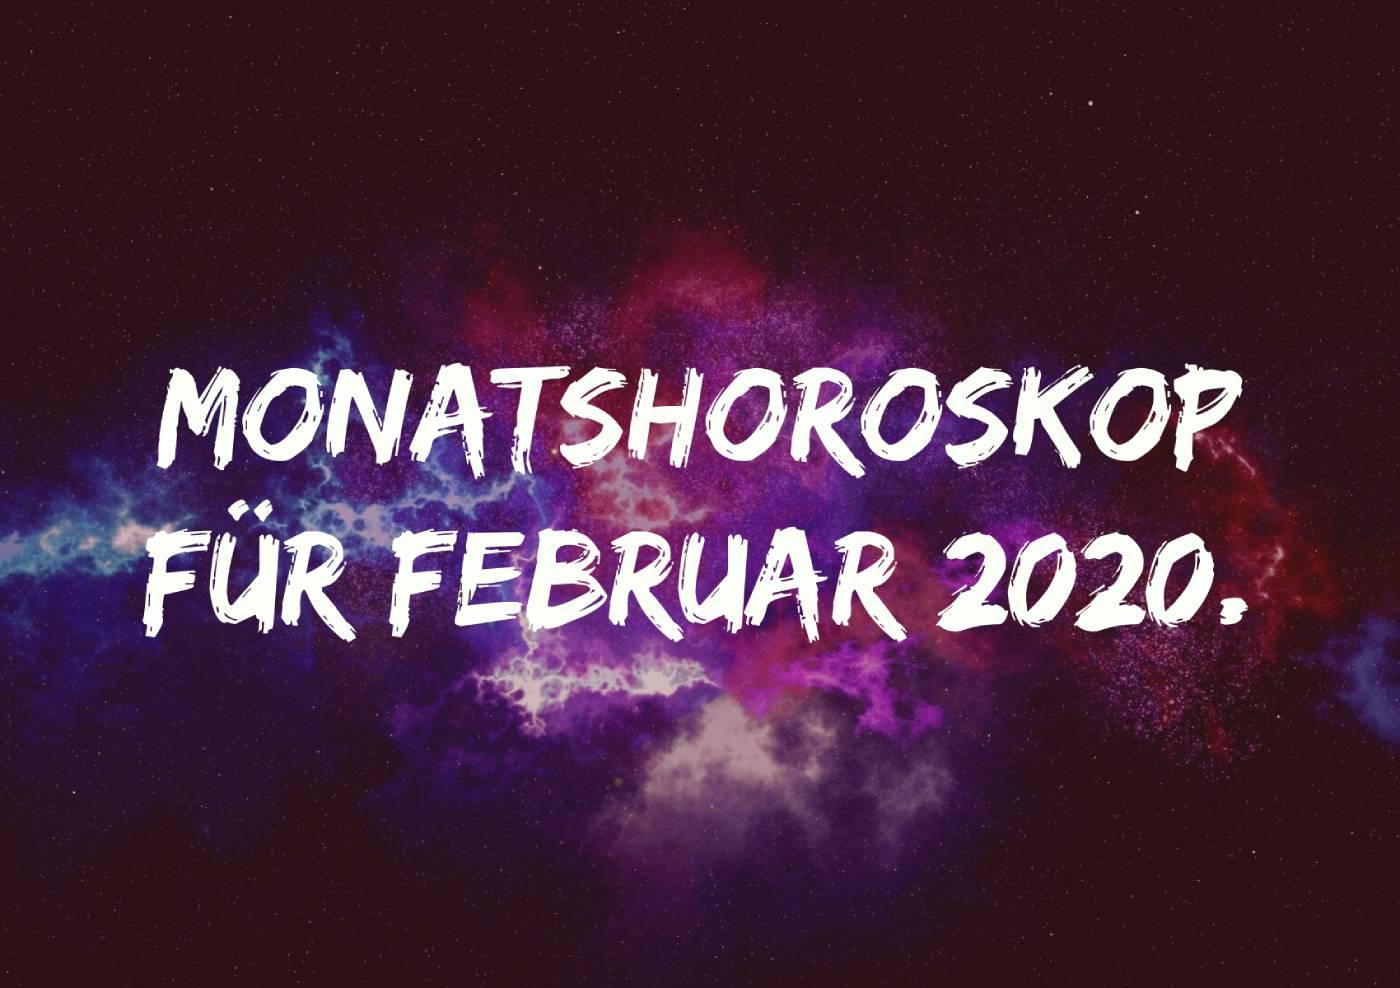 Monatshoroskop für Februar 2020.